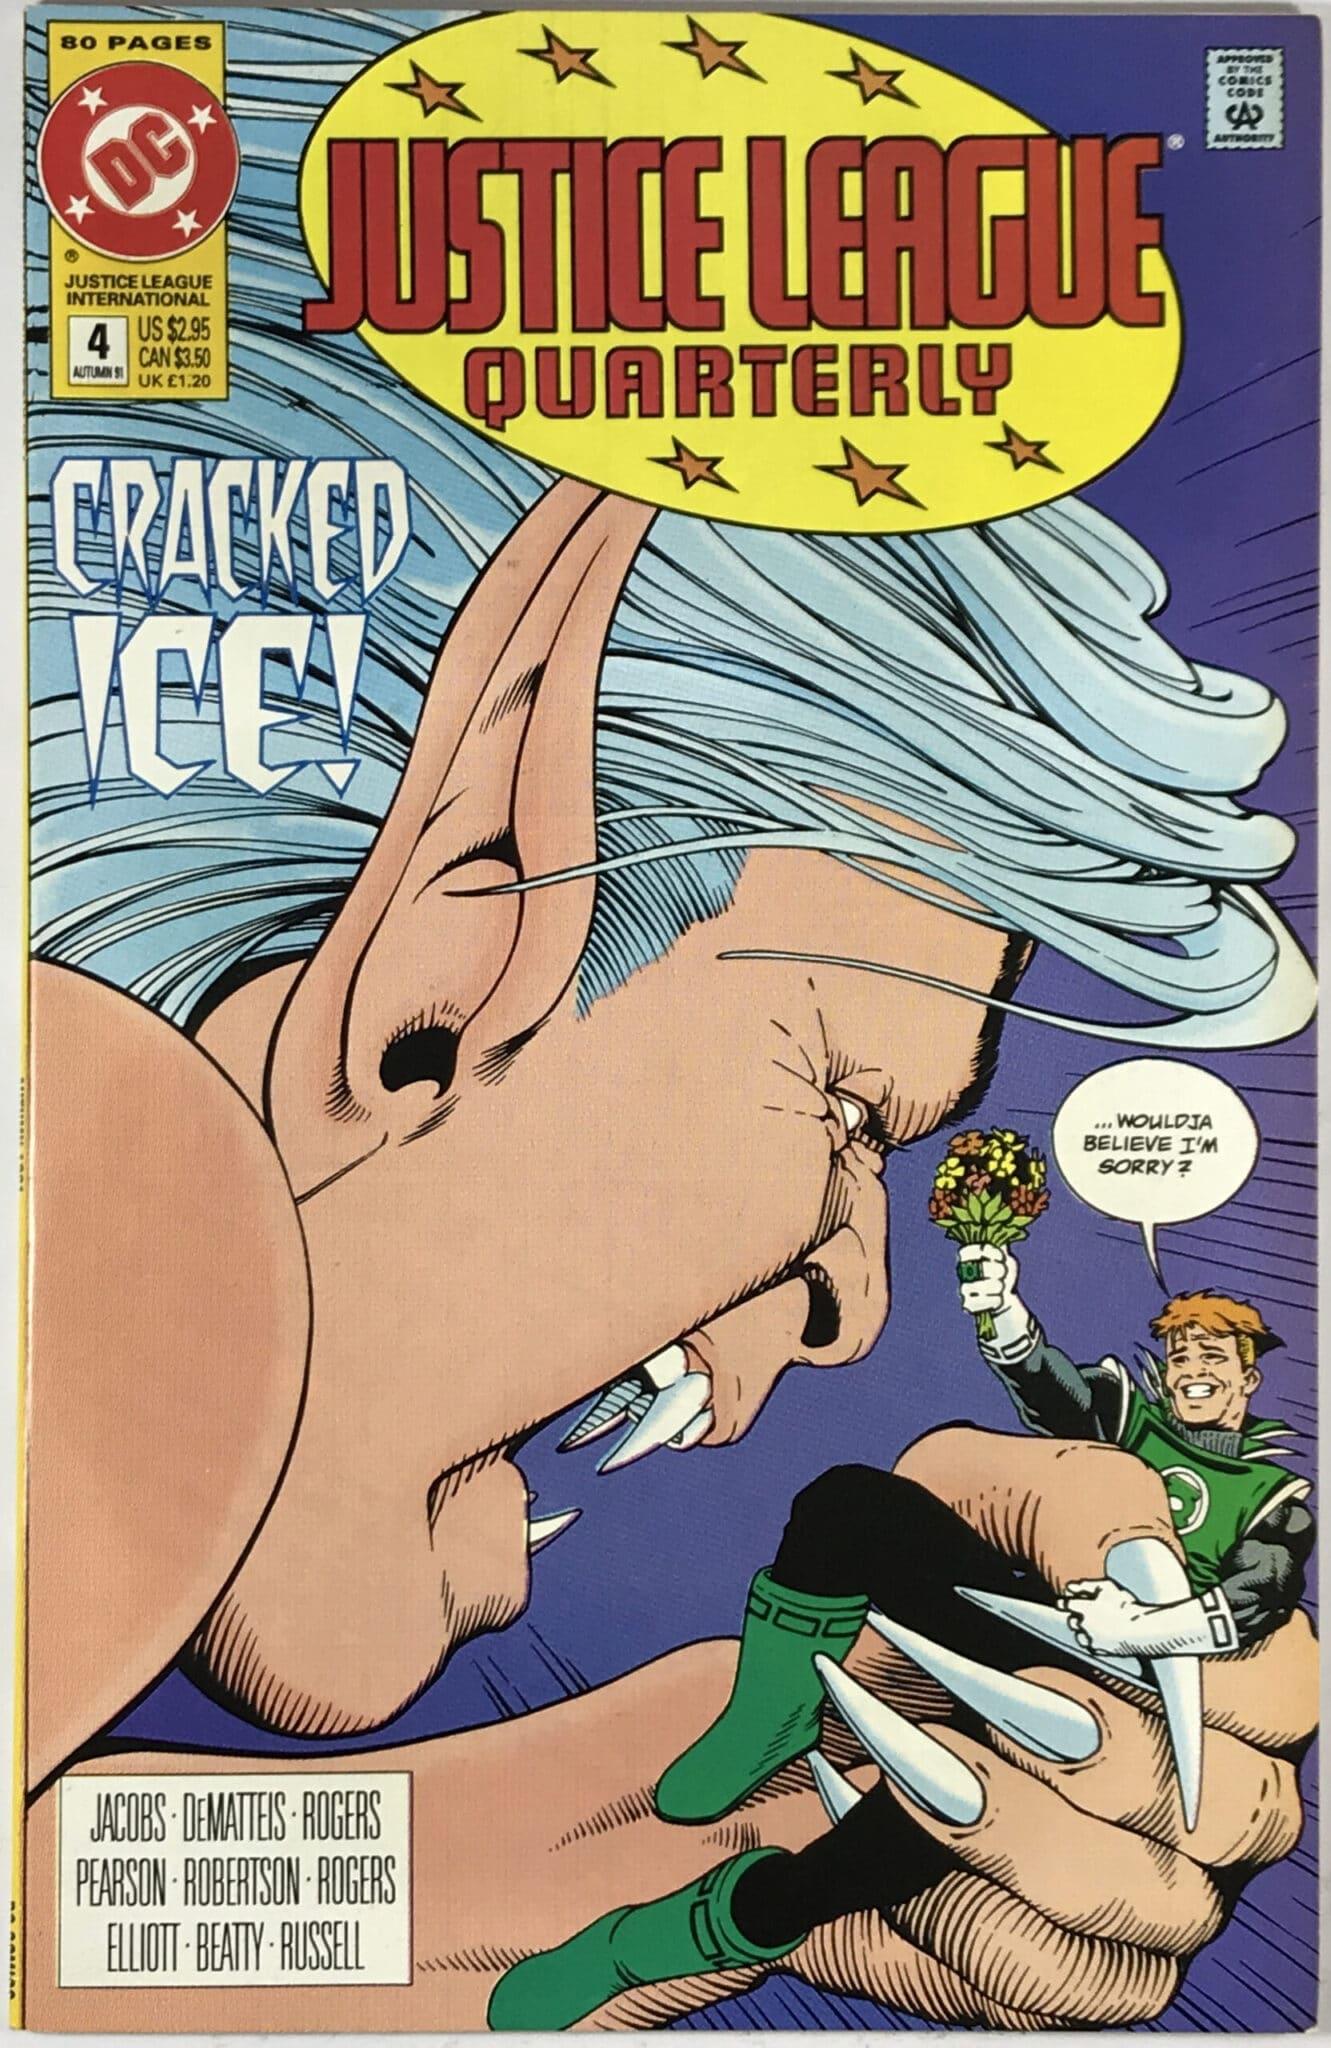 Justice League Quarterly (1990-1994) #4 - Very Fine